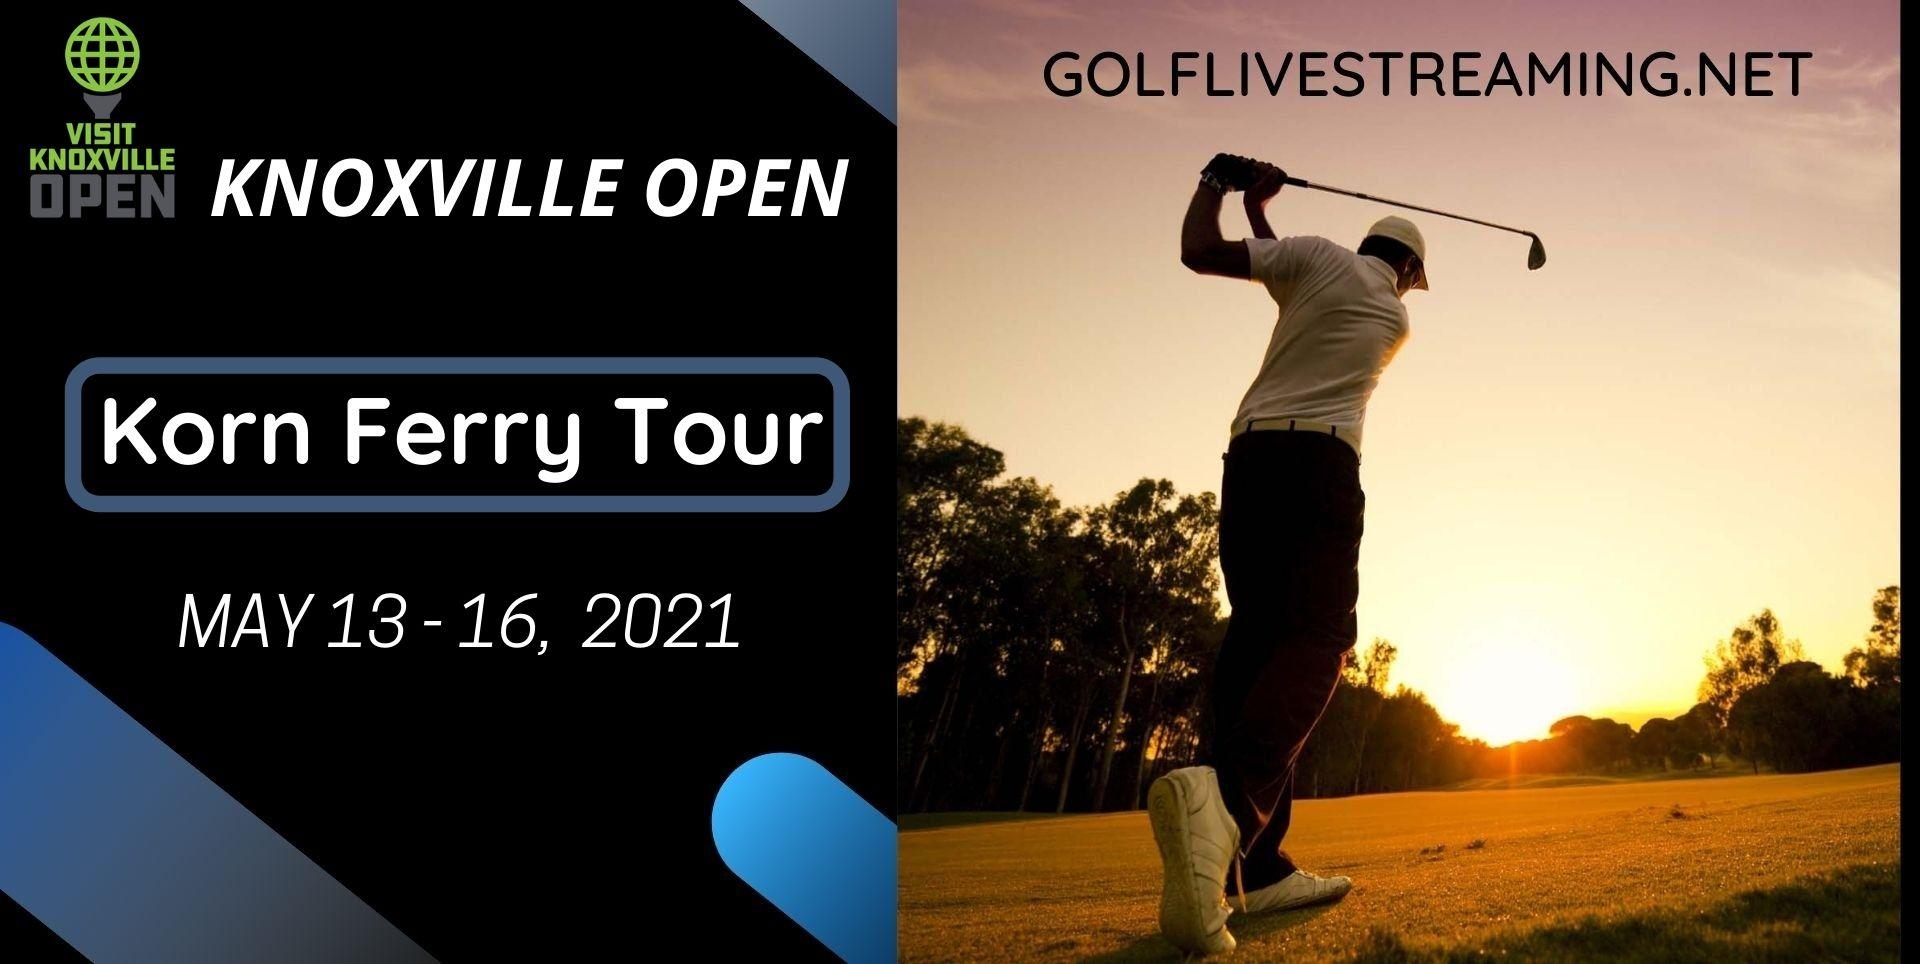 Knoxville Open Korn Ferry Golf Live Stream